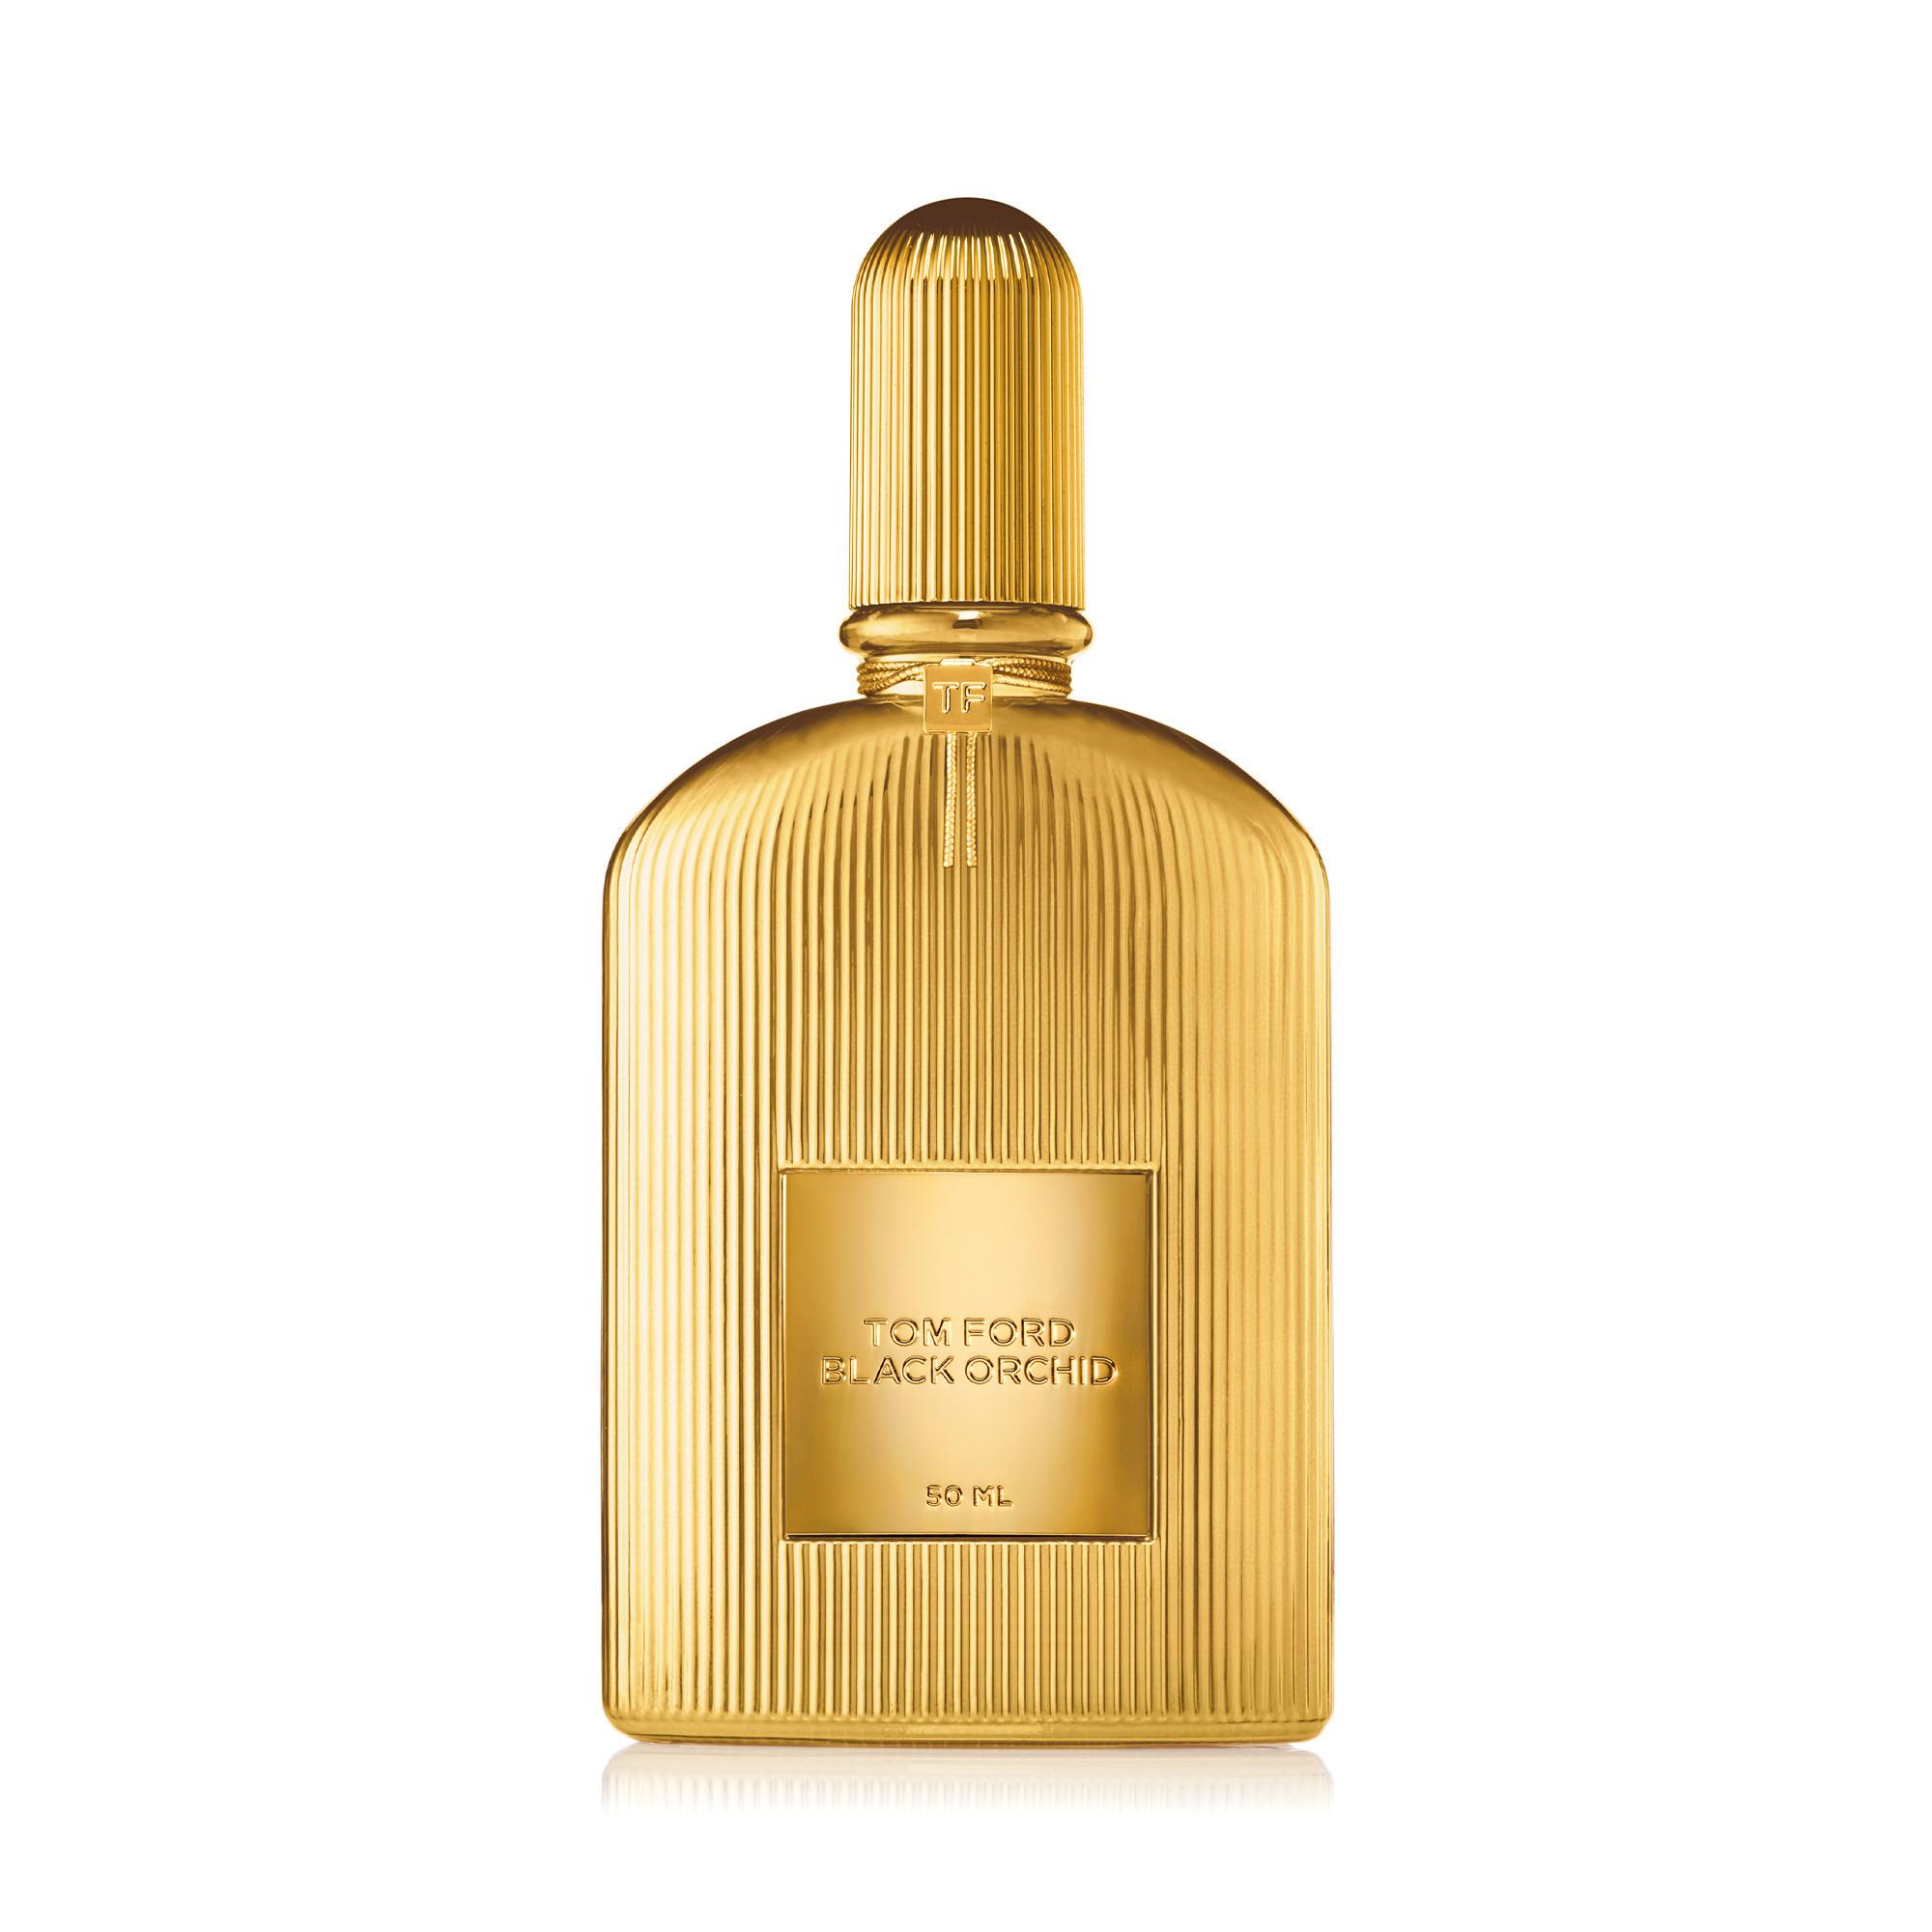 Tom Ford Black Orchid parfum 50 ml, Nero, large image number 0